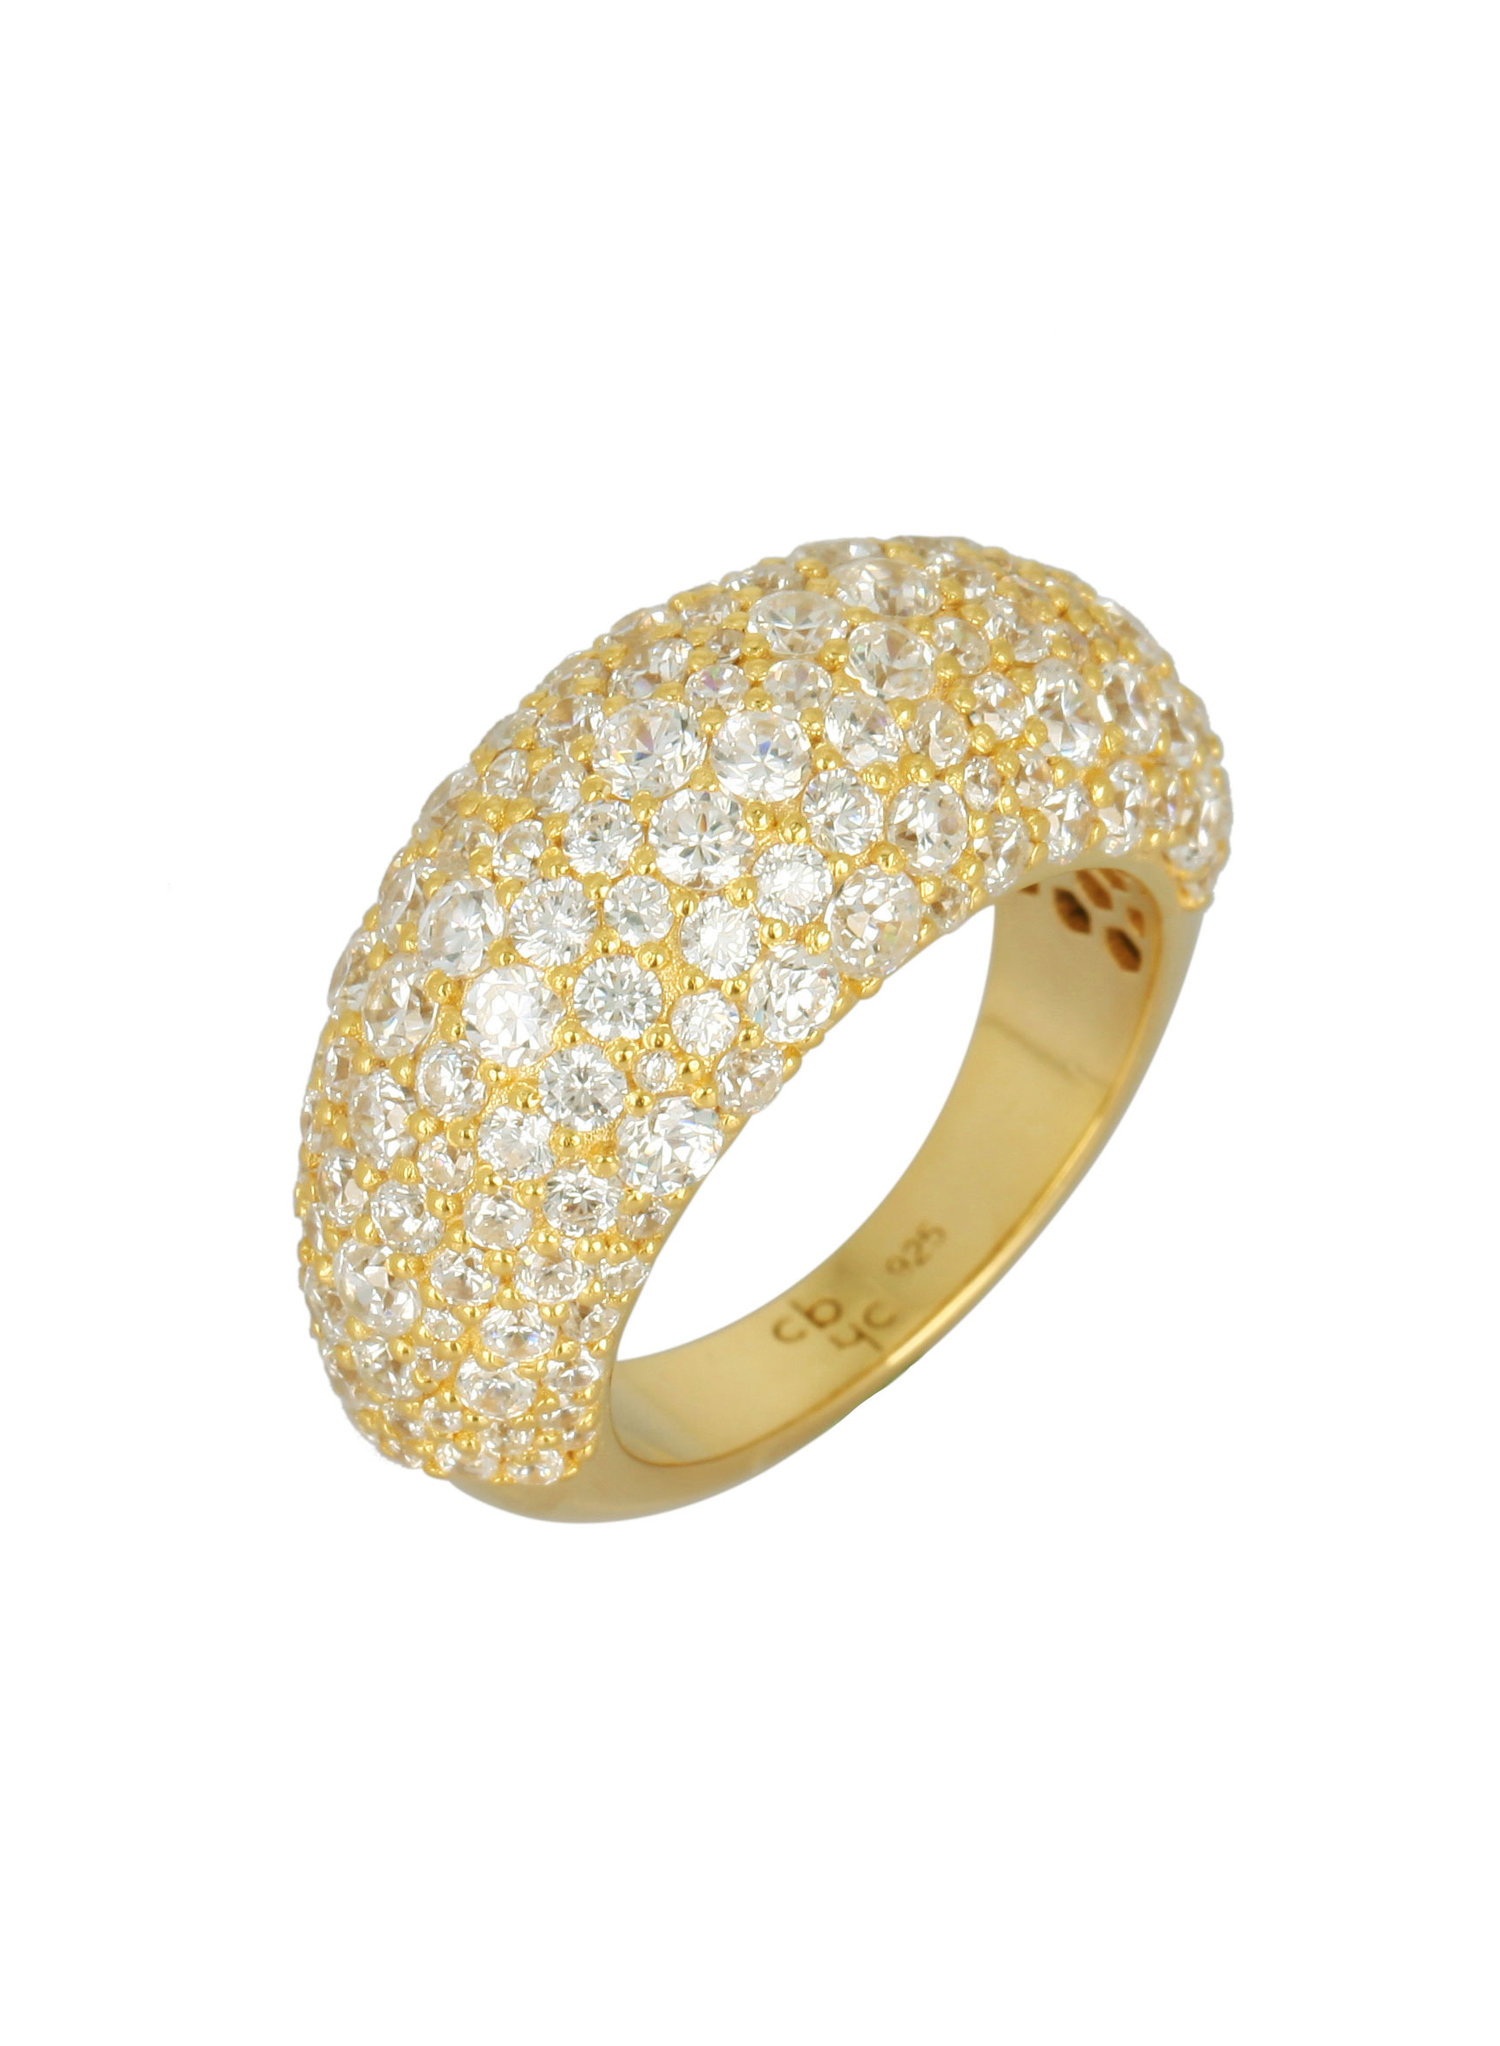 7c67e8e7d7617 Pebble Ring — CbyC